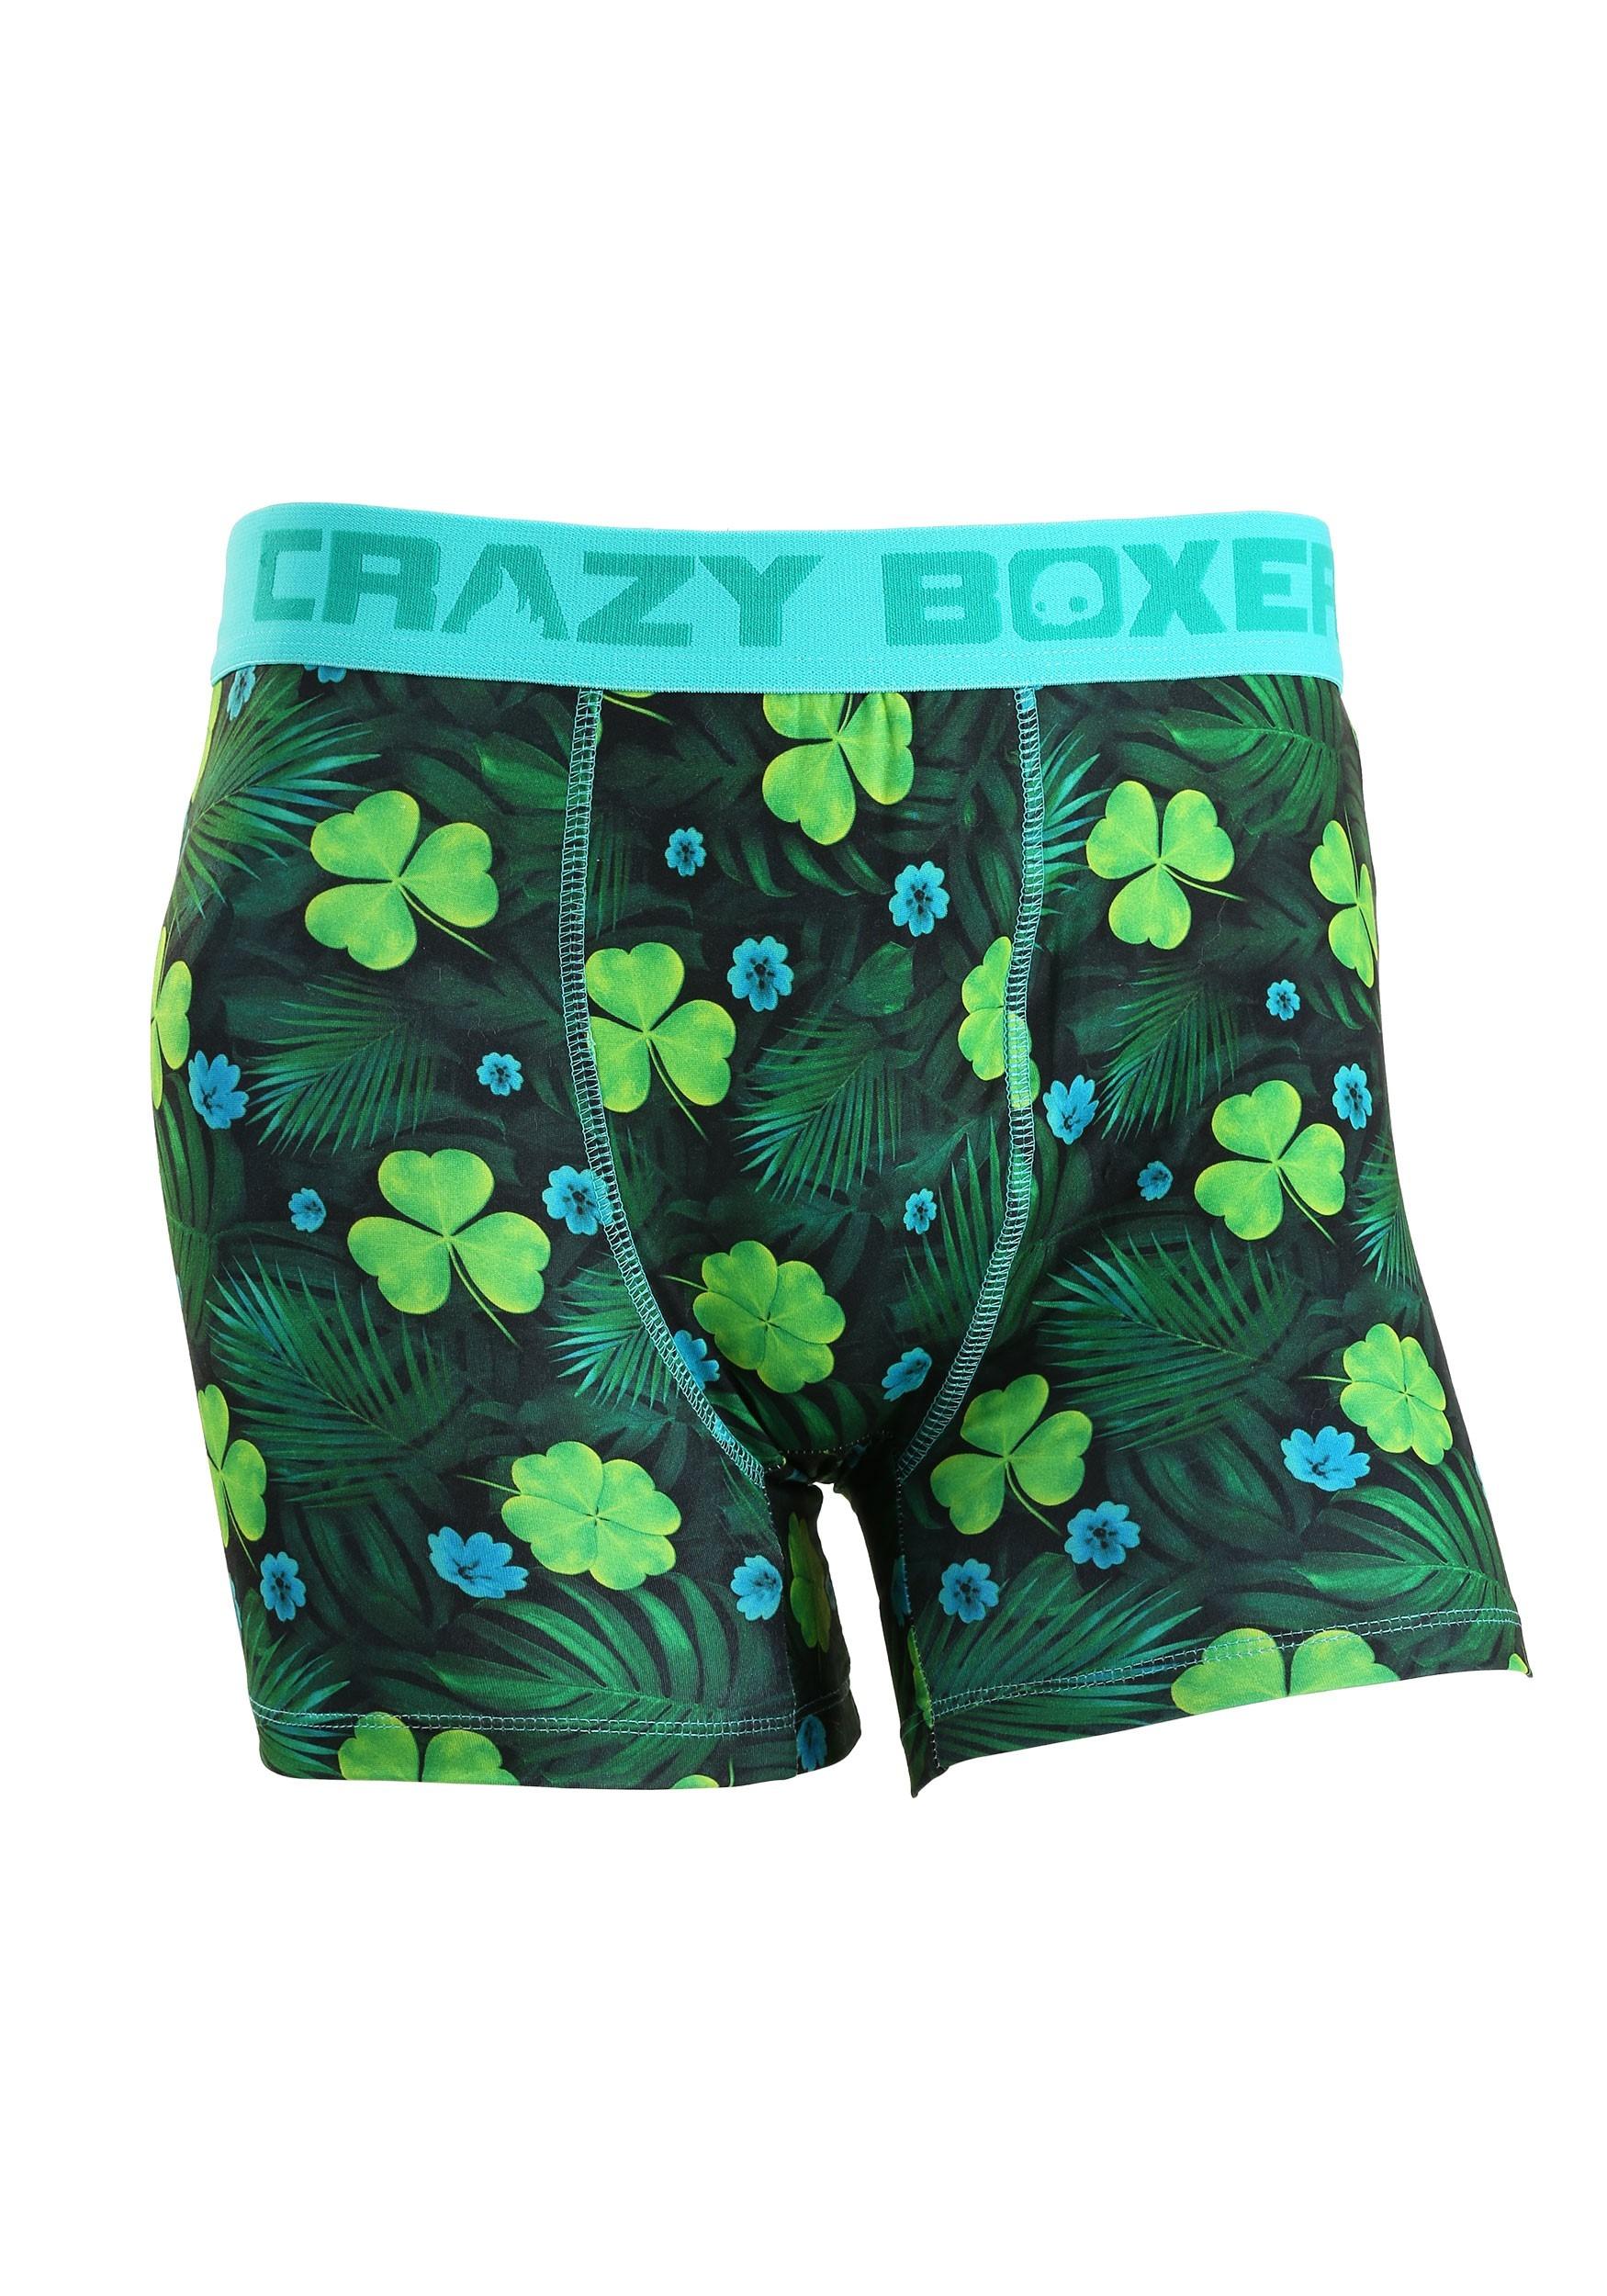 Shamrock Get Lucky Crazy Boxers Mens Boxer Briefs